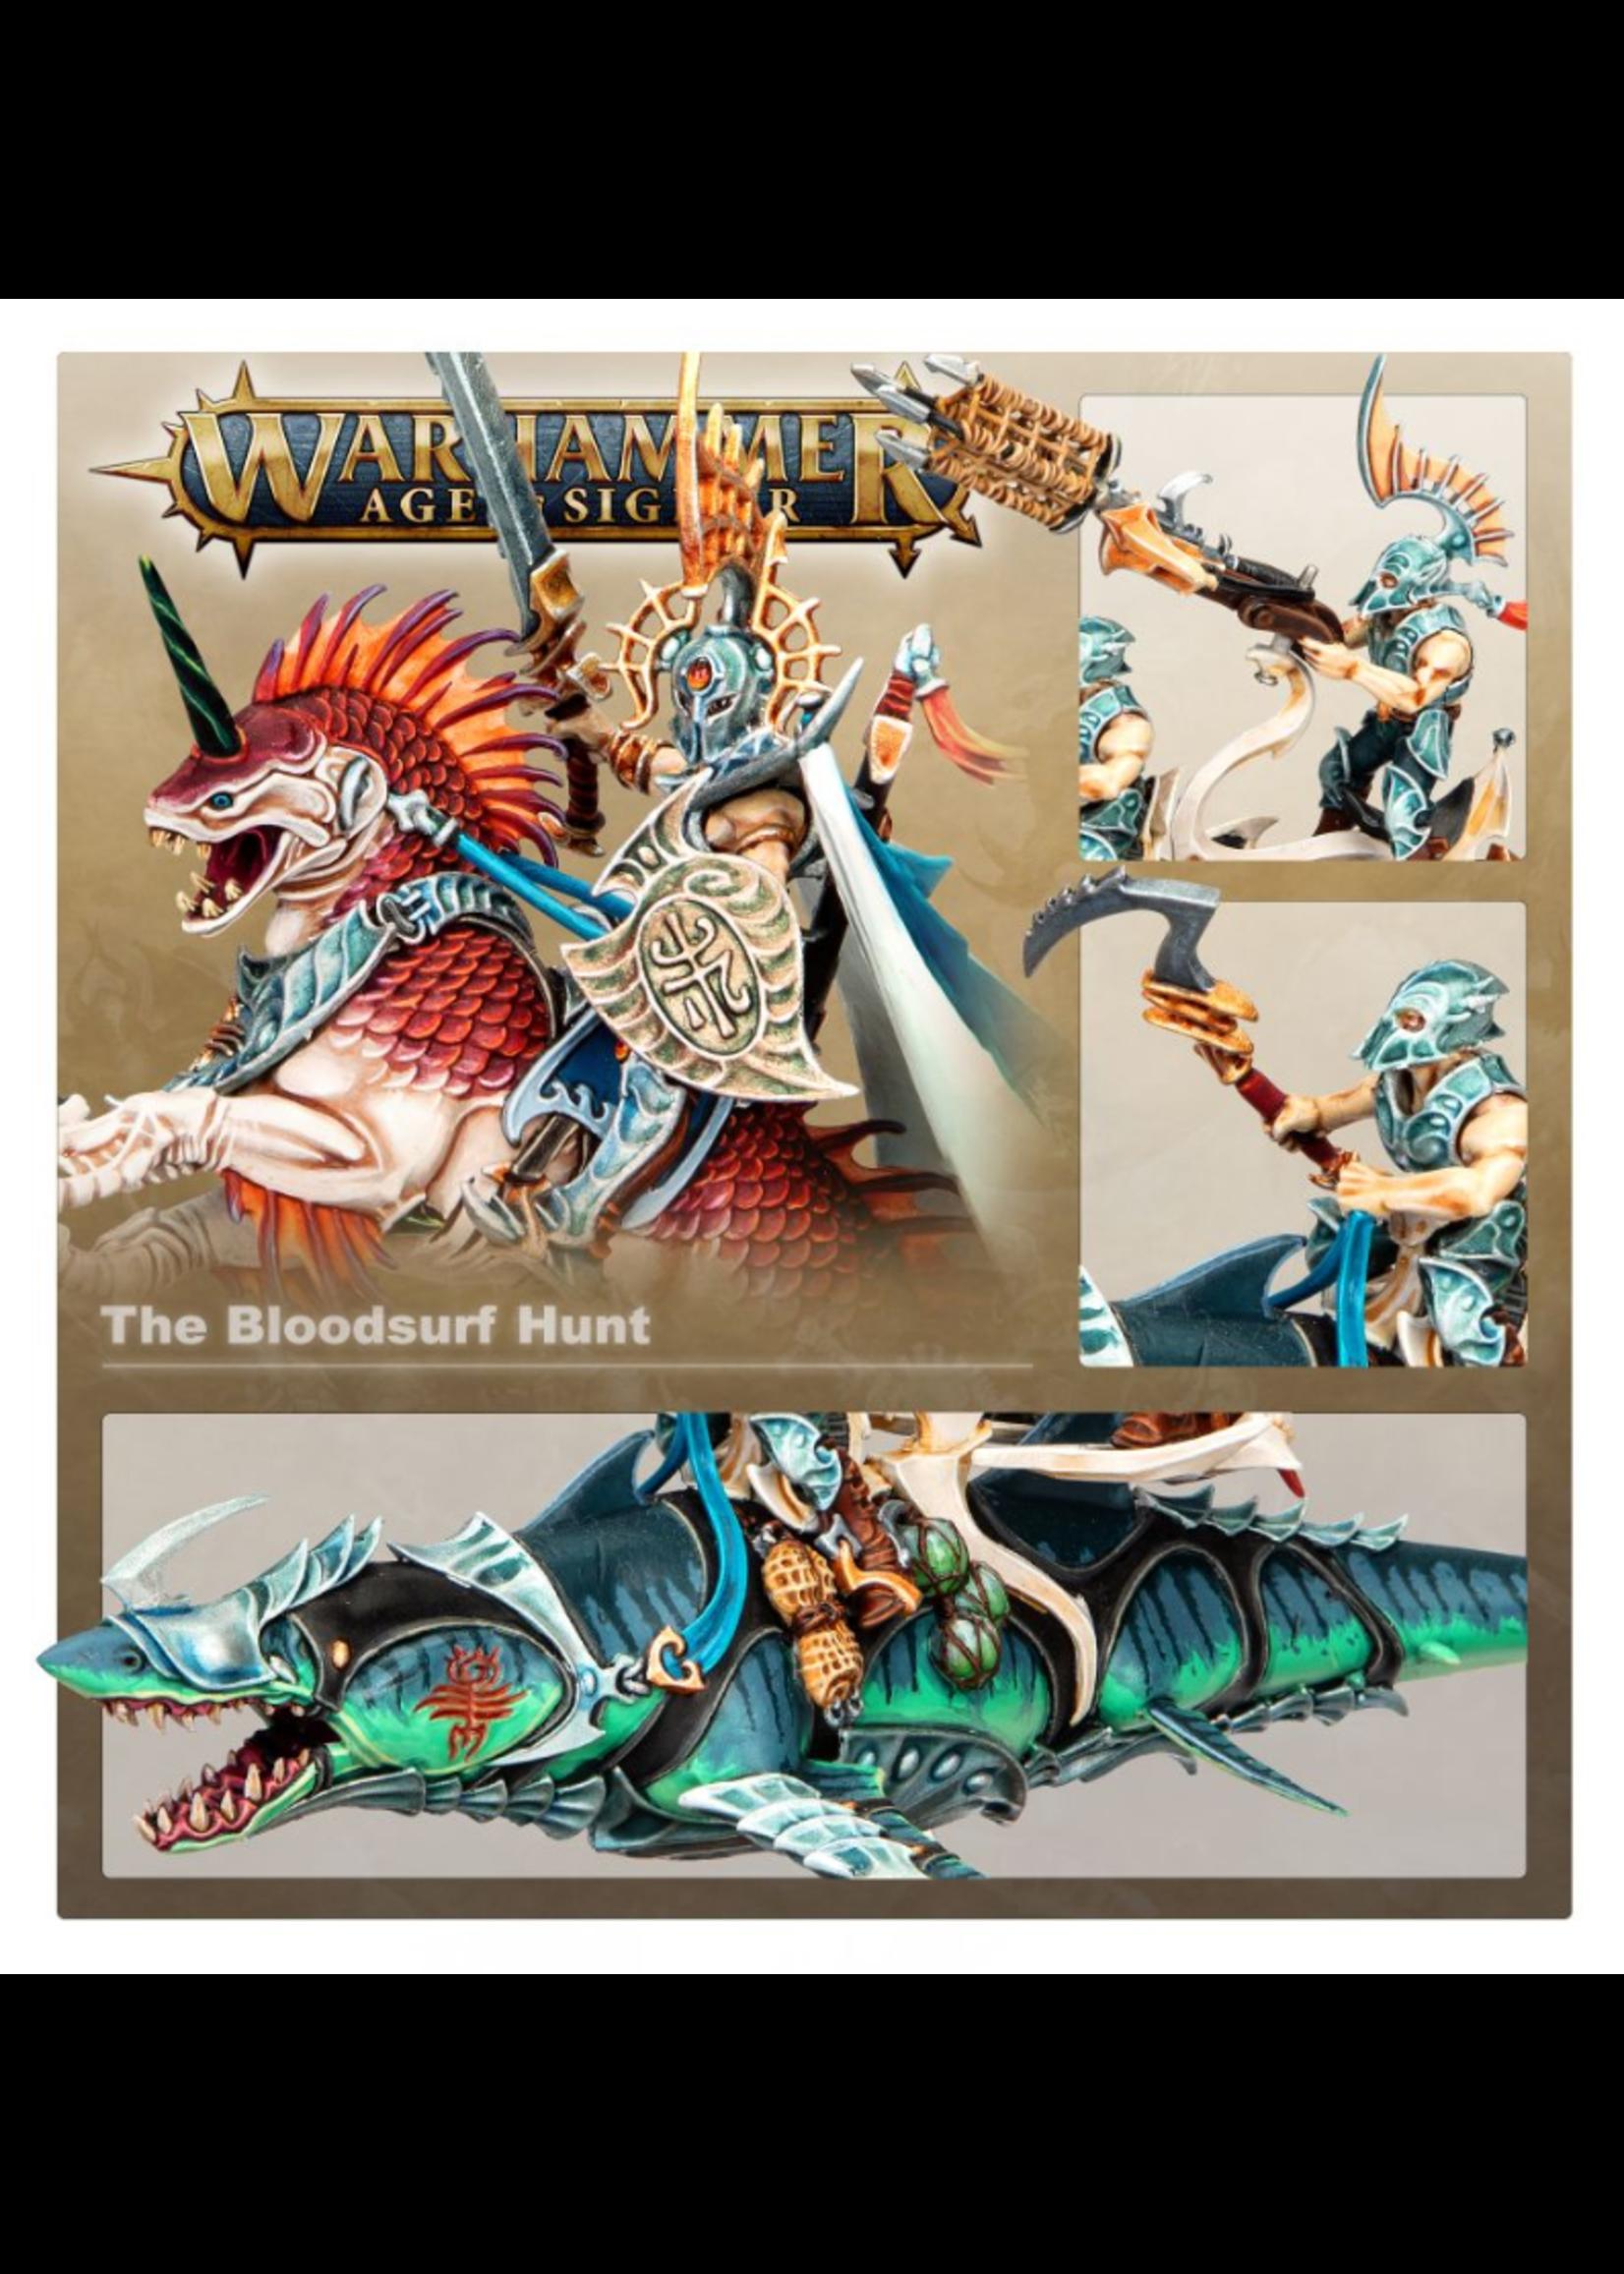 Warhammer: Age of Sigmar Broken Realms: The Bloodsurf Hunt